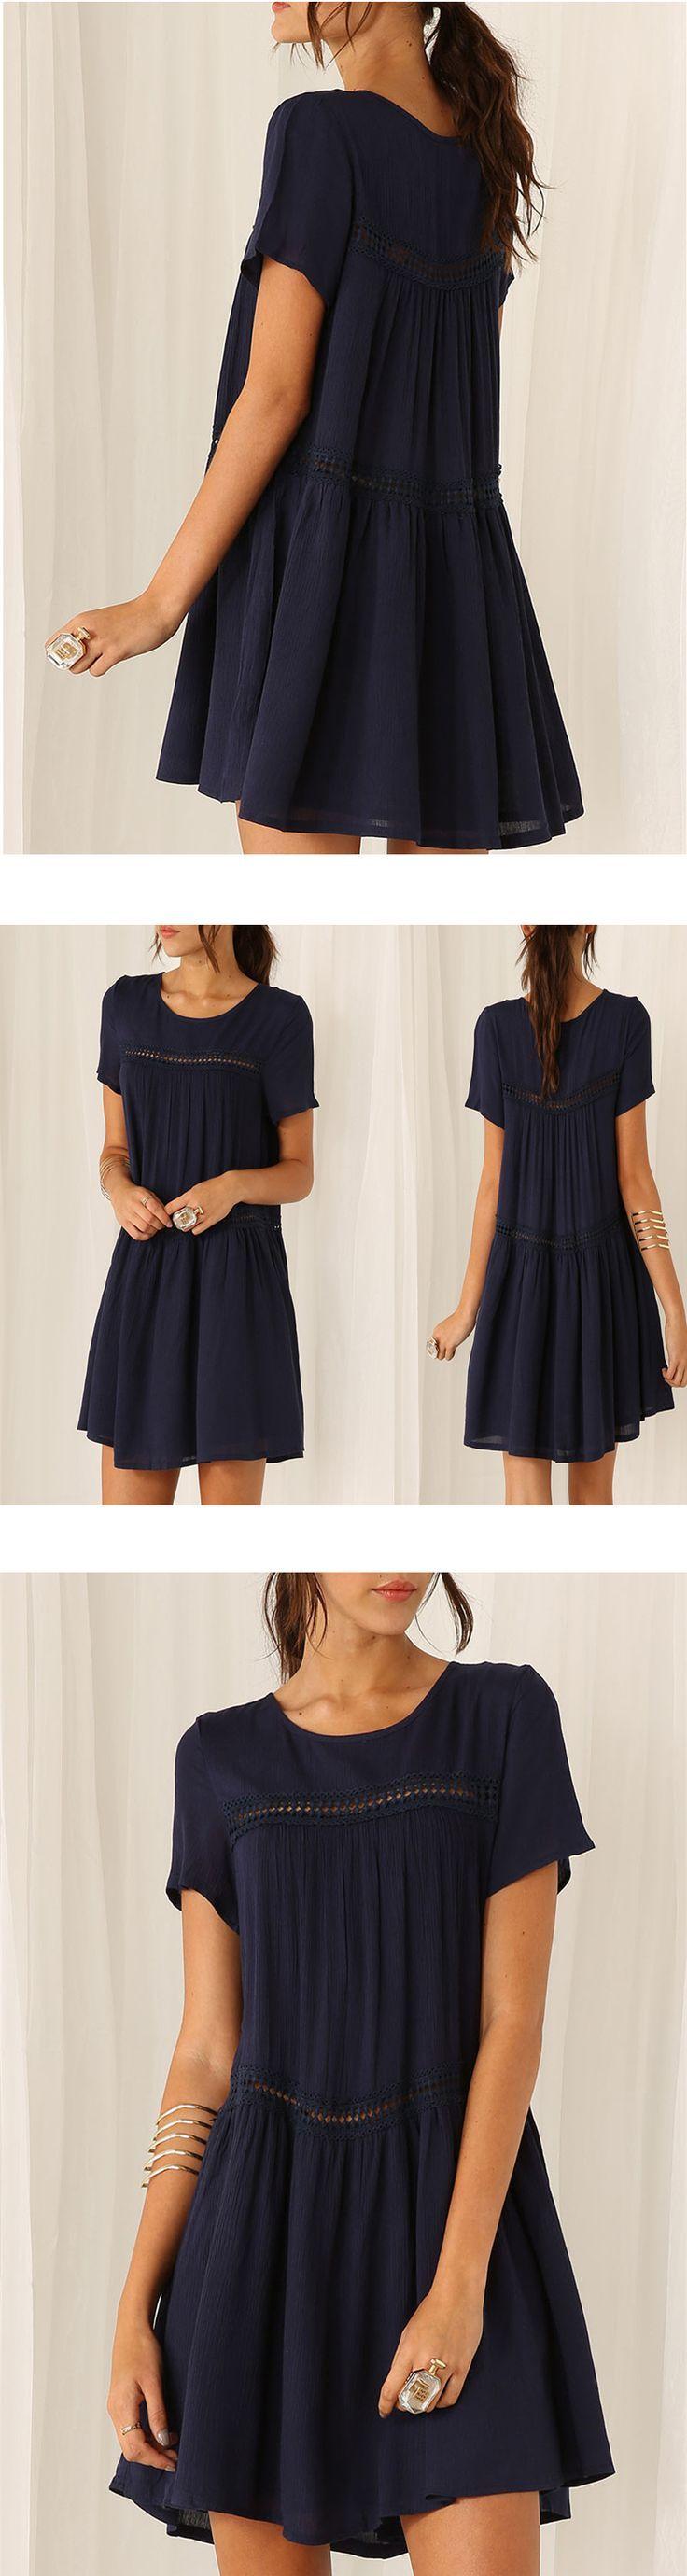 Nice tight long sleeve dress navy short sleeve shift dress shein